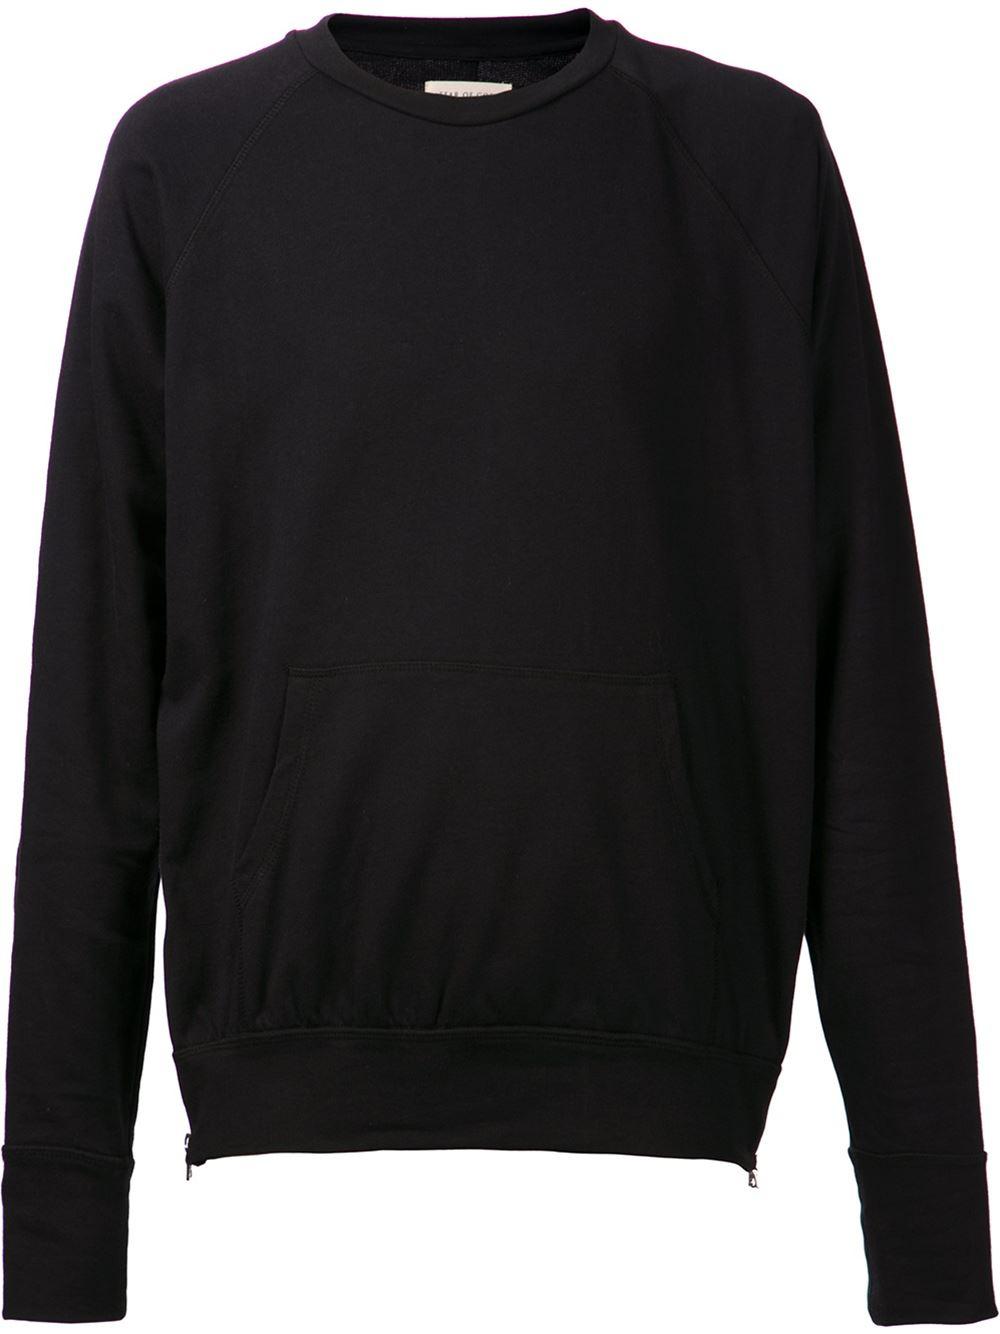 Fear of god Basic Sweater in Black for Men | Lyst